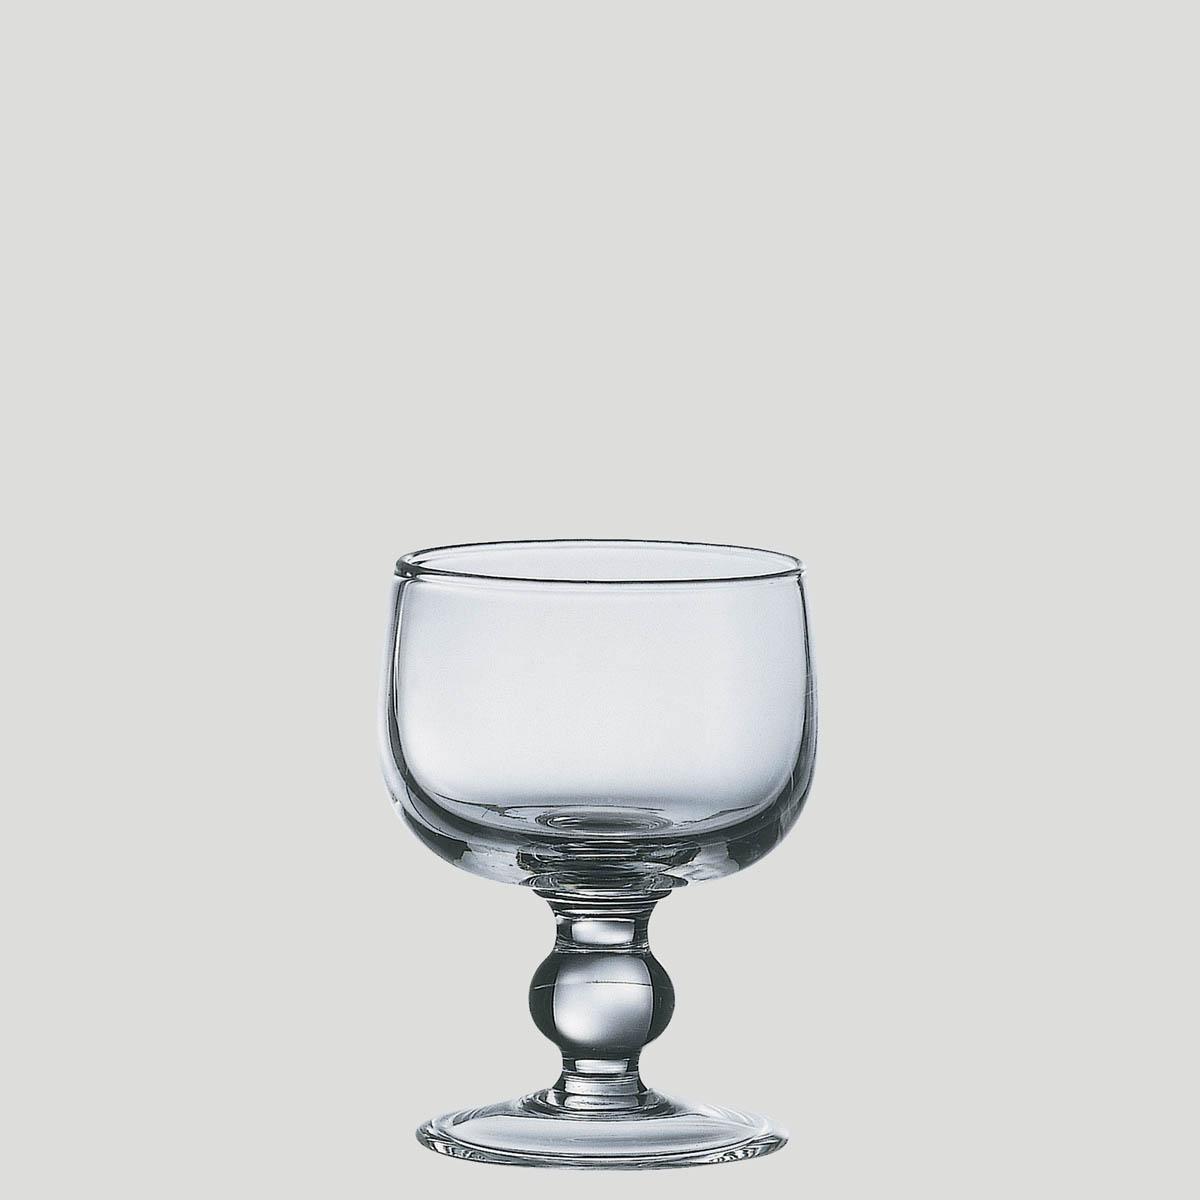 Balloon - Coppe per gelato in vetro - Gardagel